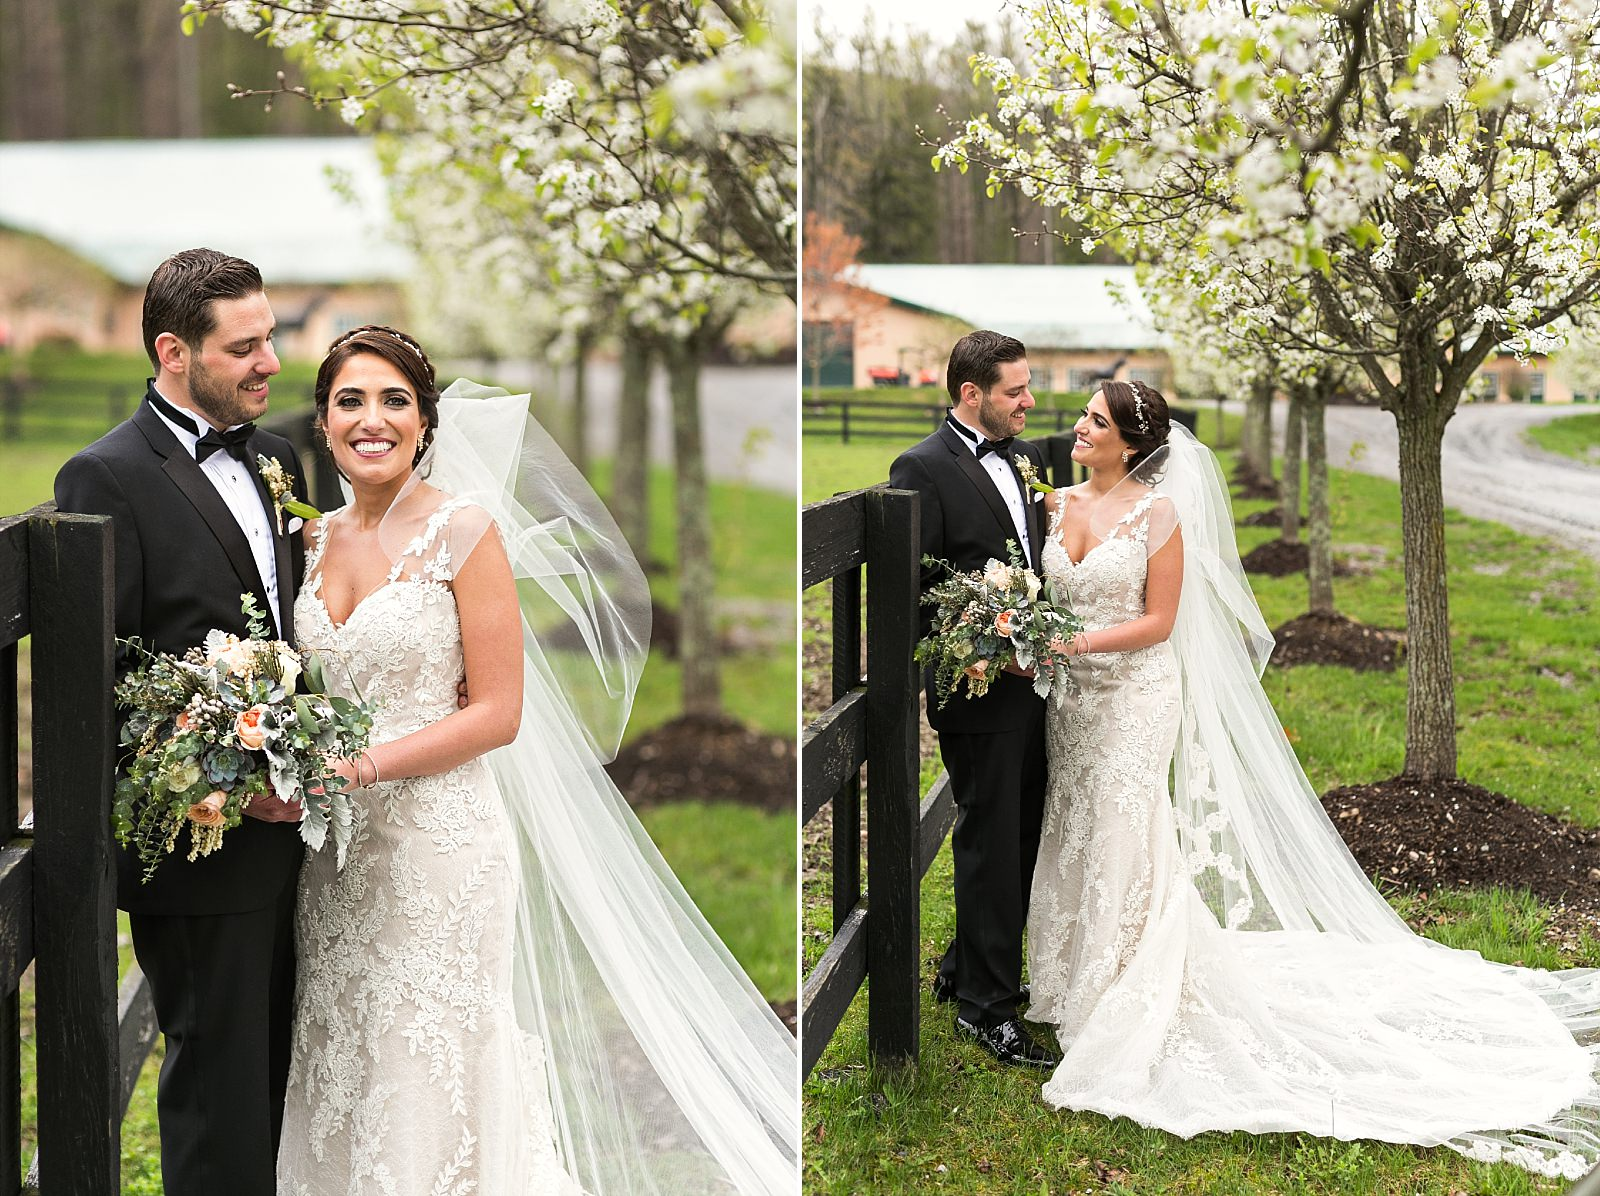 NY_Wedding_Photographer_NiPe_33.jpg